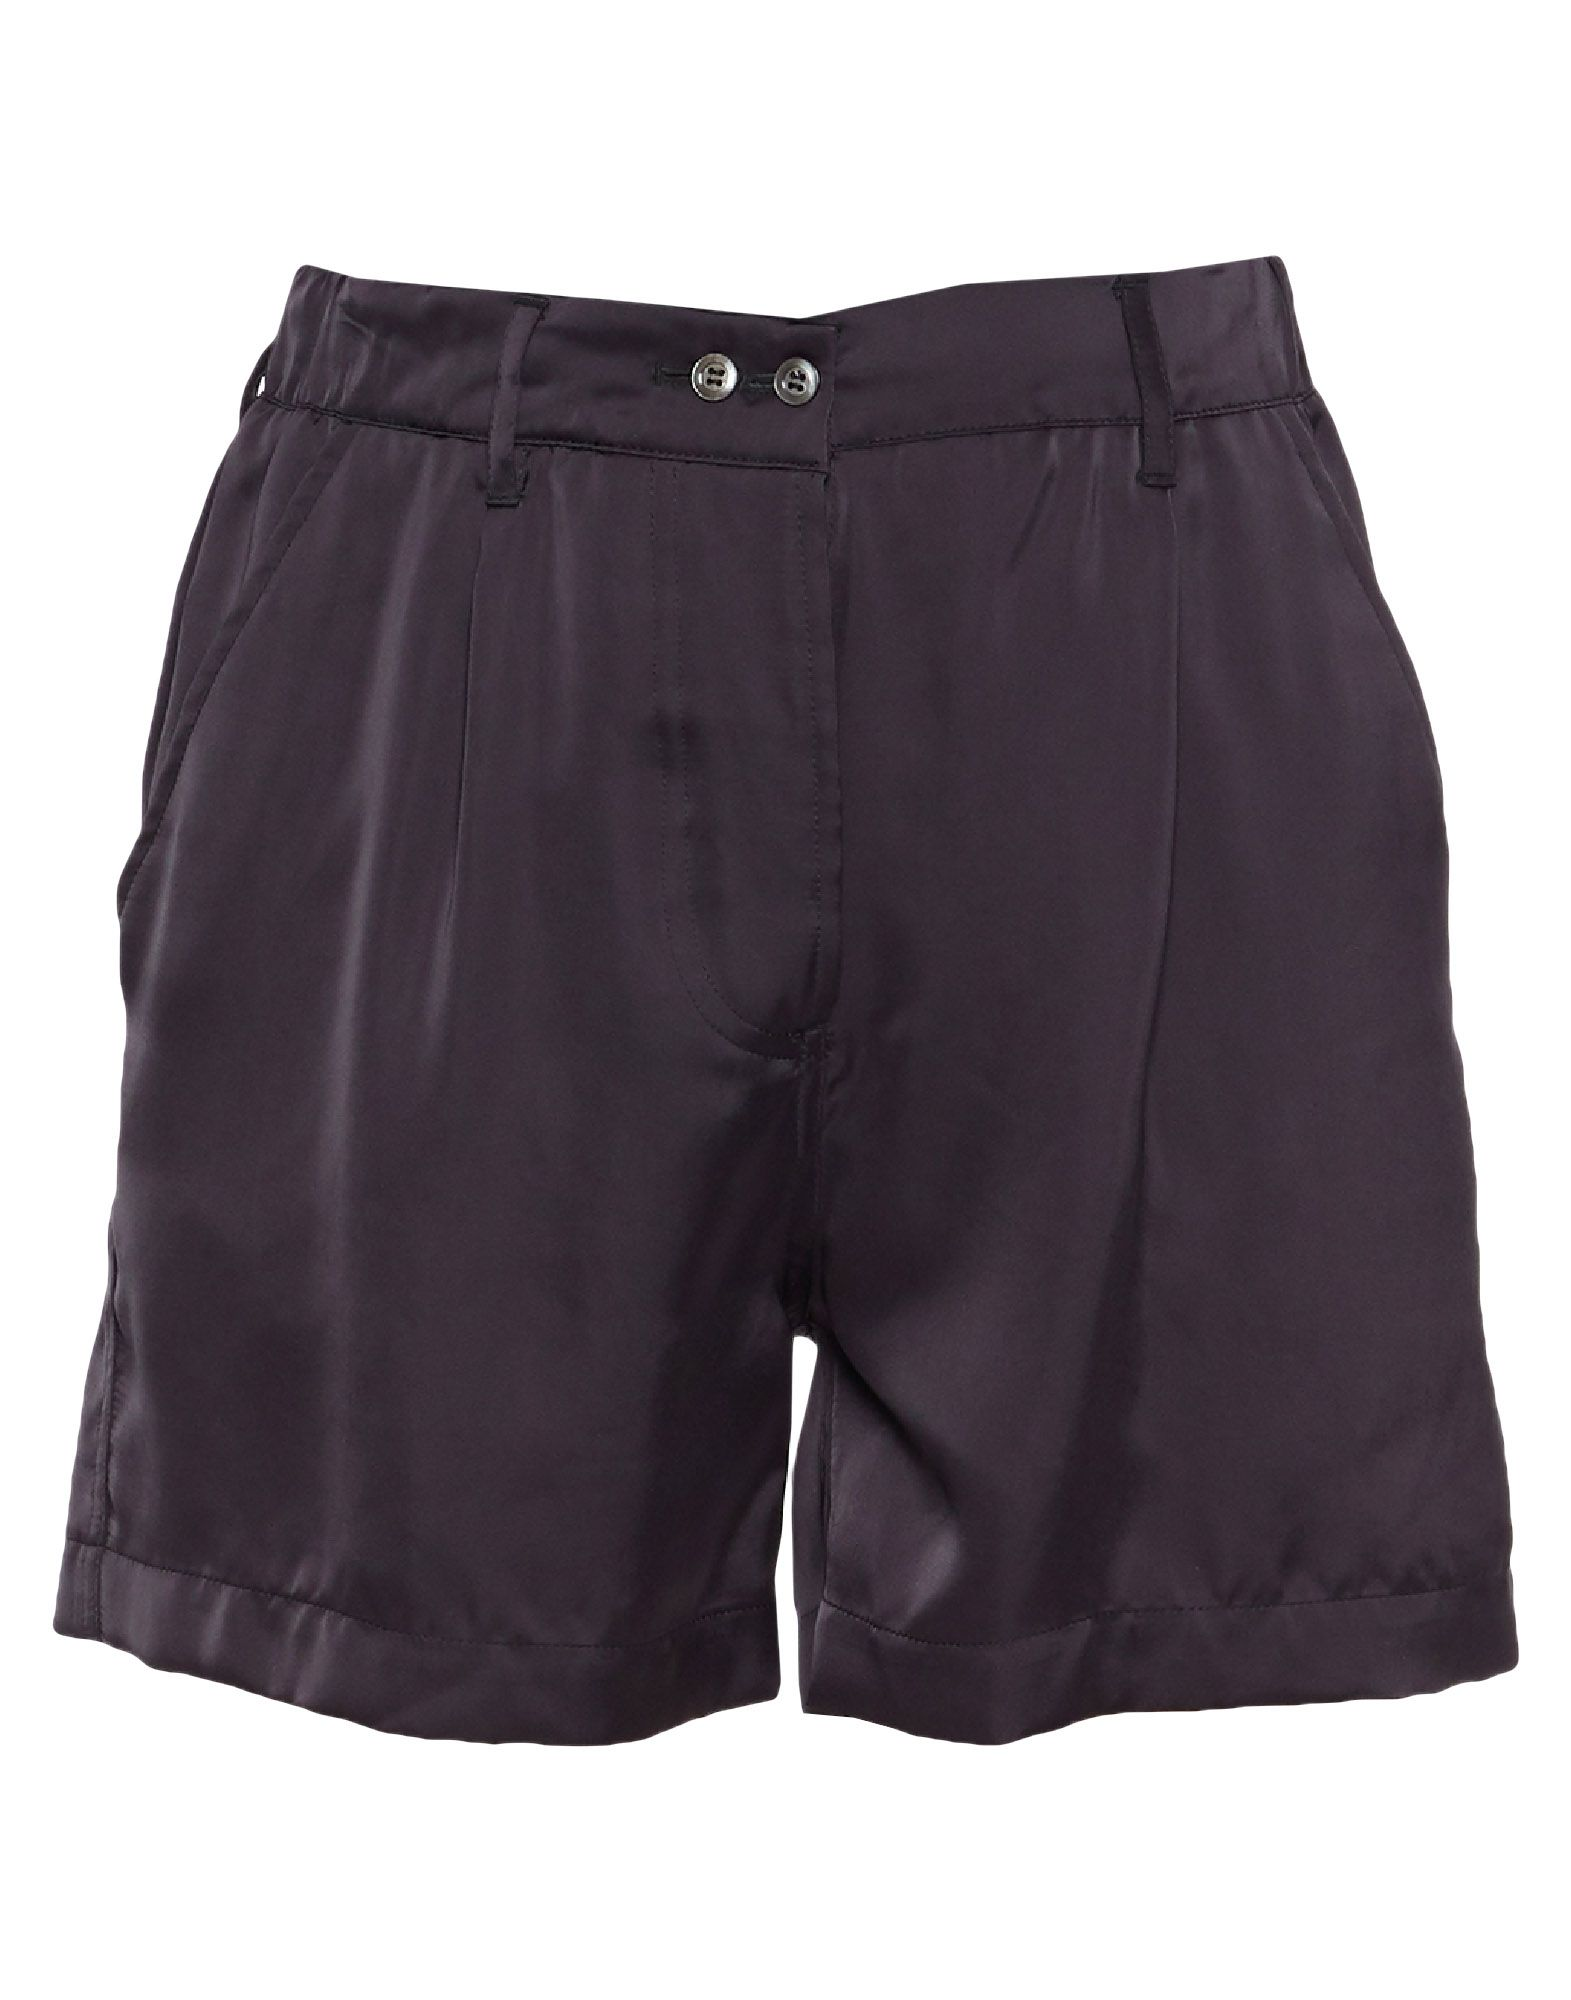 SANTONI Shorts. satin, solid color, regular fit, high waisted, straight leg, no appliqués, multipockets, button closing. 60% Triacetate, 40% Cupro